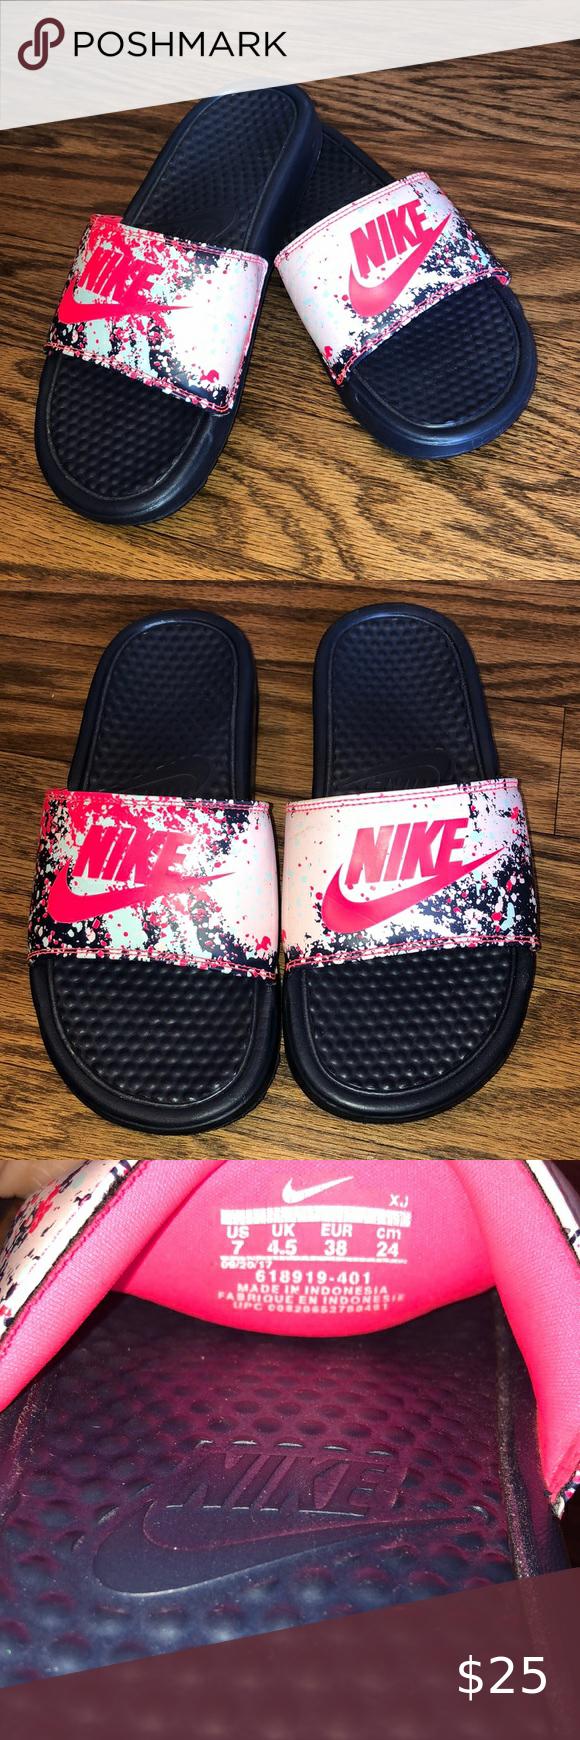 nike slides size 6.5